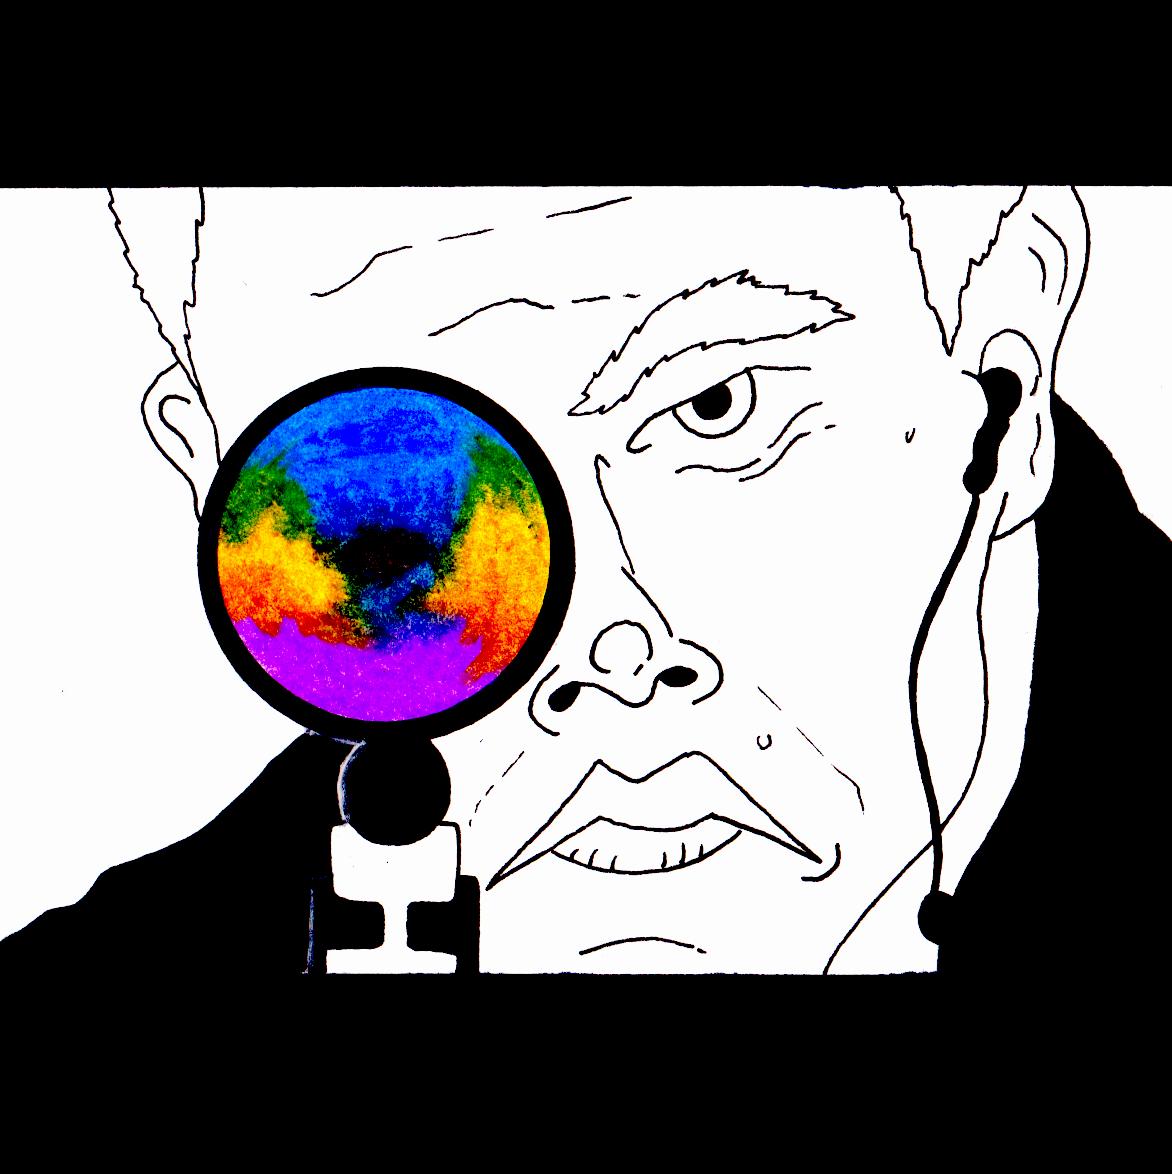 Jason Furie : Jason Bourne